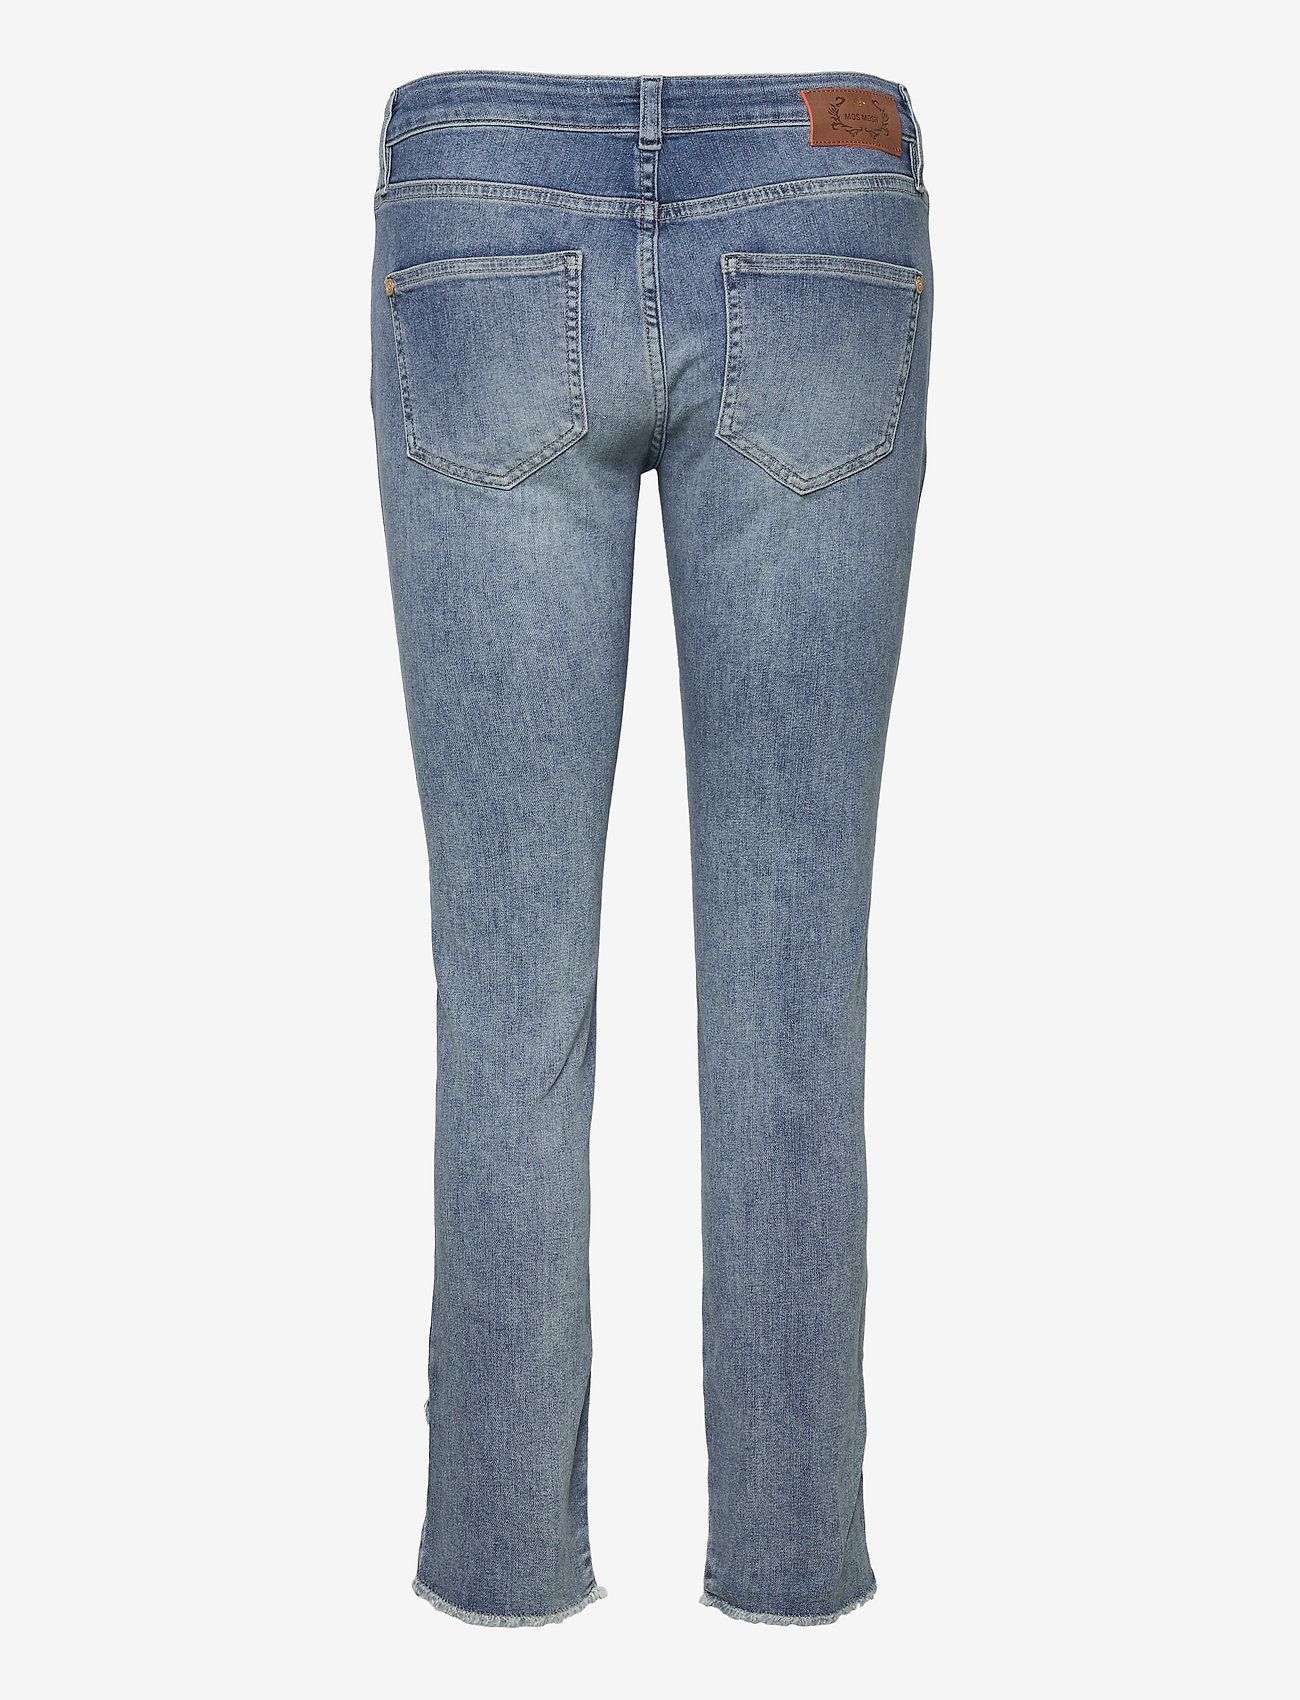 MOS MOSH - Sumner Epic Jeans - slim jeans - light blue - 1